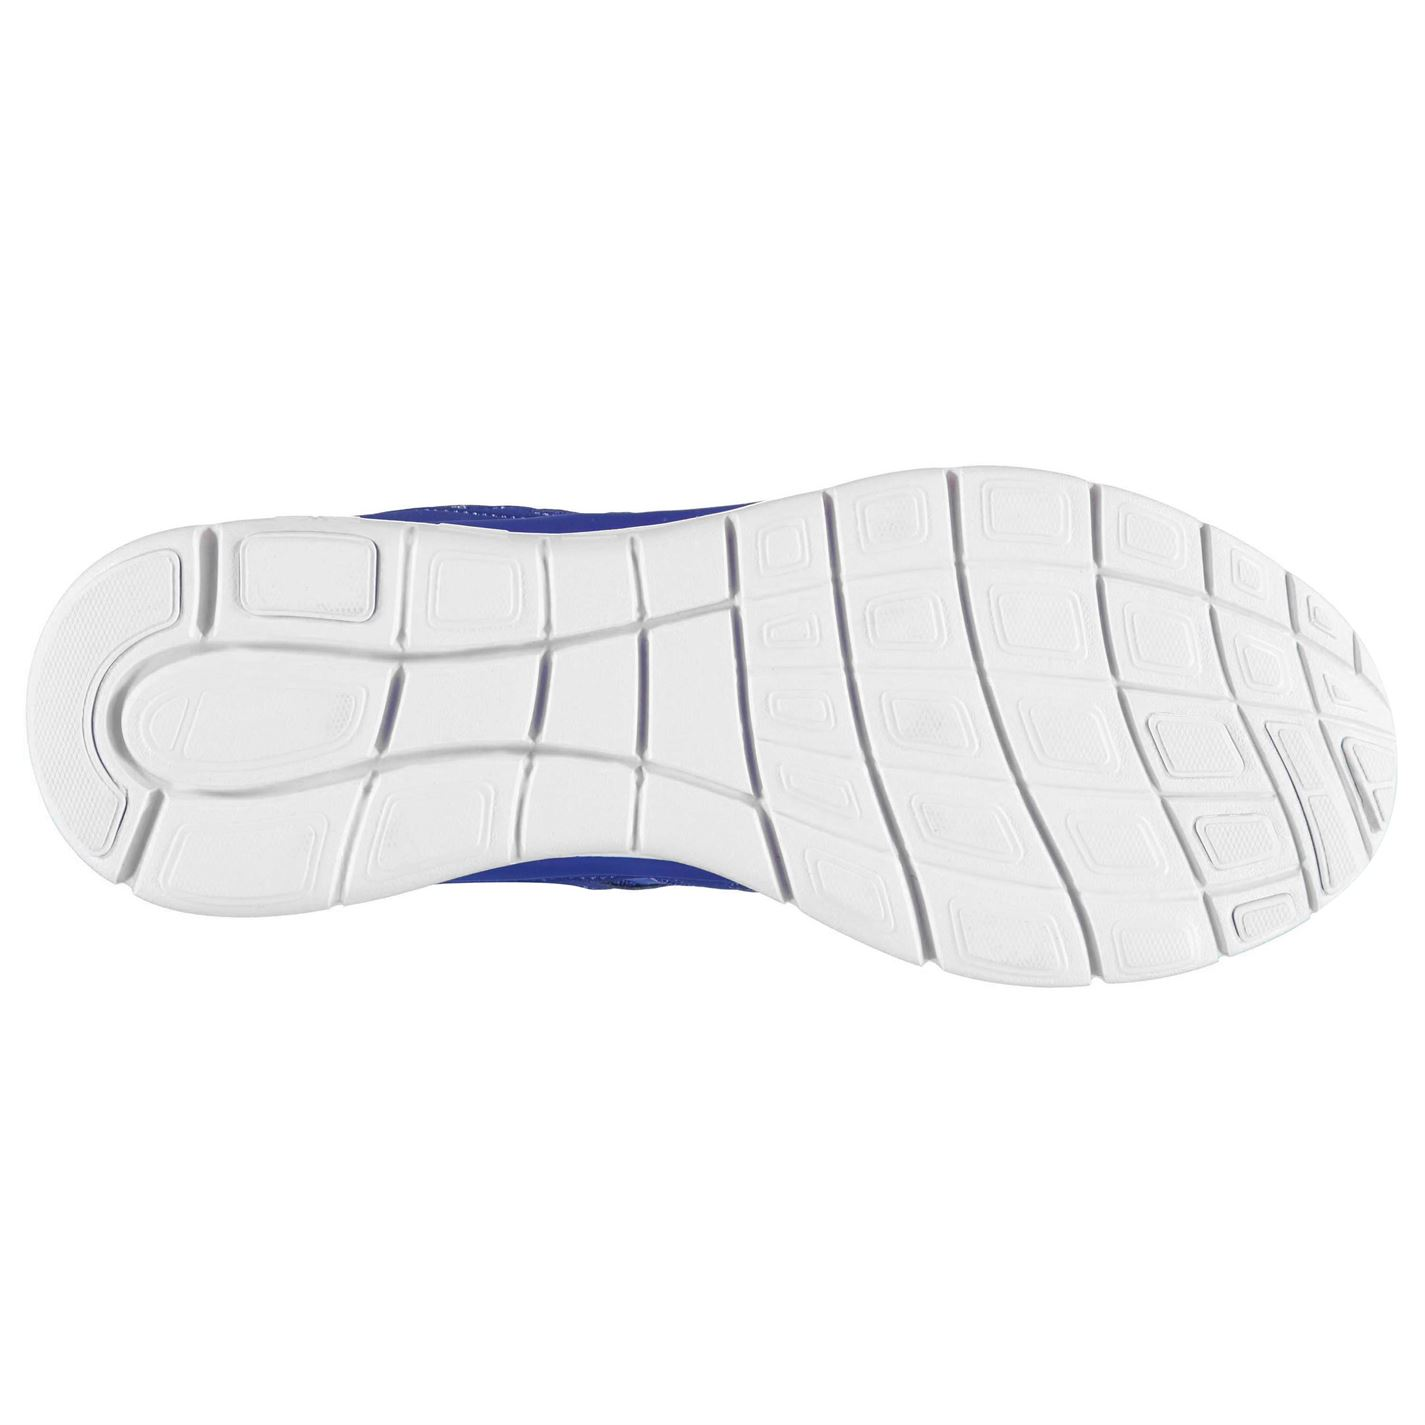 Karrimor-Mens-Duma-Trainers-Lace-Up-Sports-Running-Cross-Training-Shoes thumbnail 41